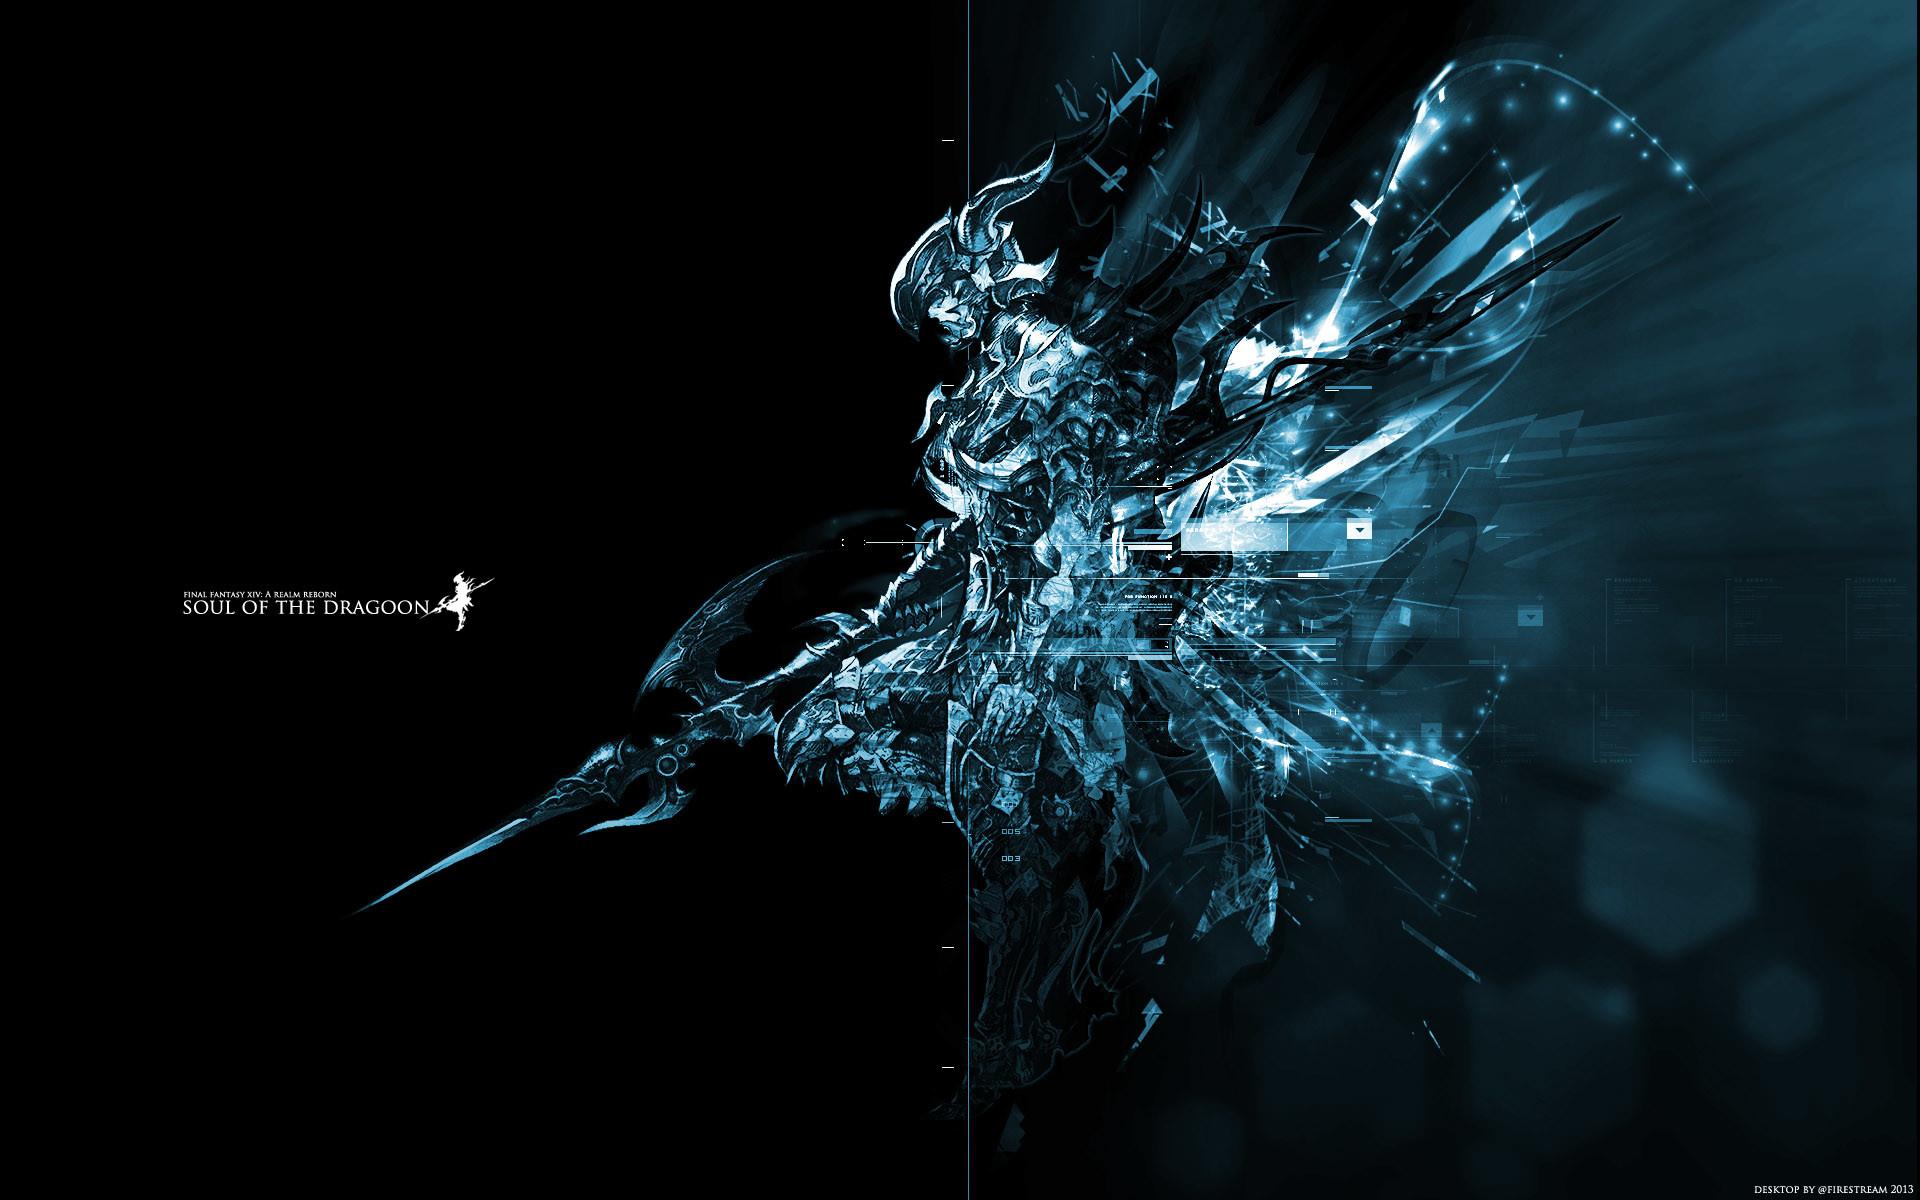 Soul of the Dragoon  https://firestream.net/2013/desktops/ffxiv_dragoon1920b.jpg | Final Fantasy  | Pinterest | Final fantasy, Final fantasy art and Dragons